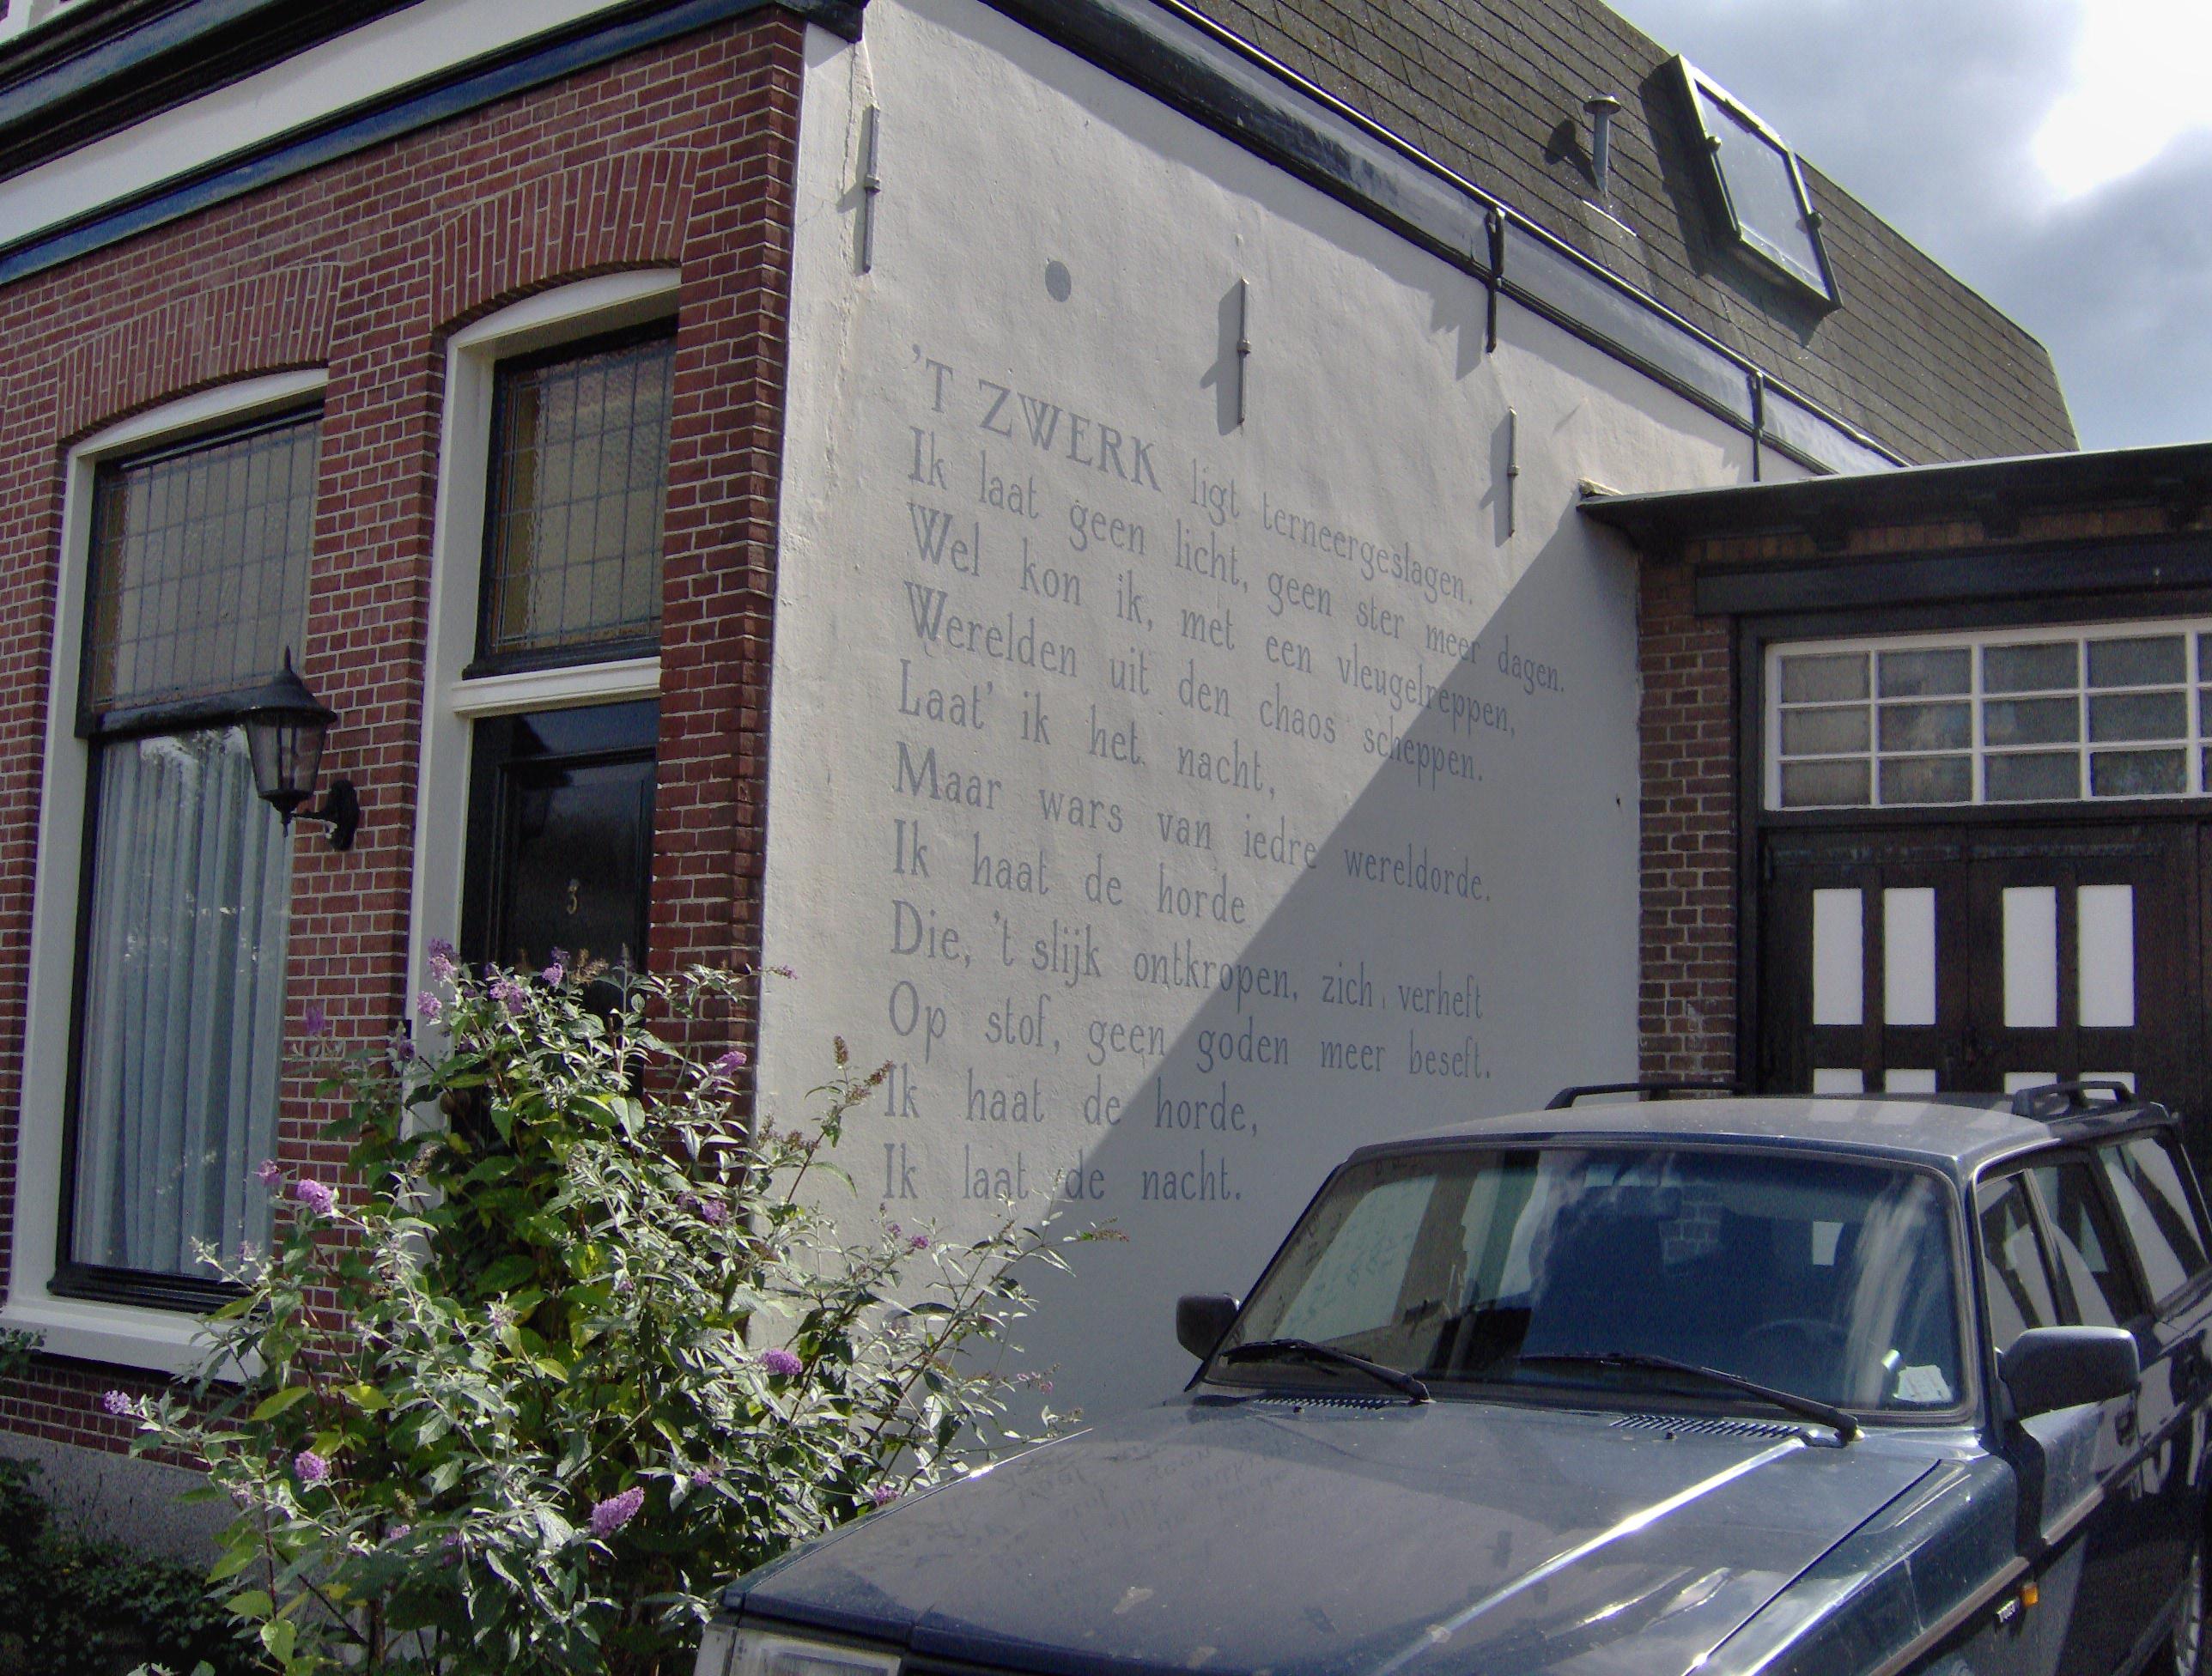 J Slauerhoff Dutch Poet Writer And Doctor 1898 1936